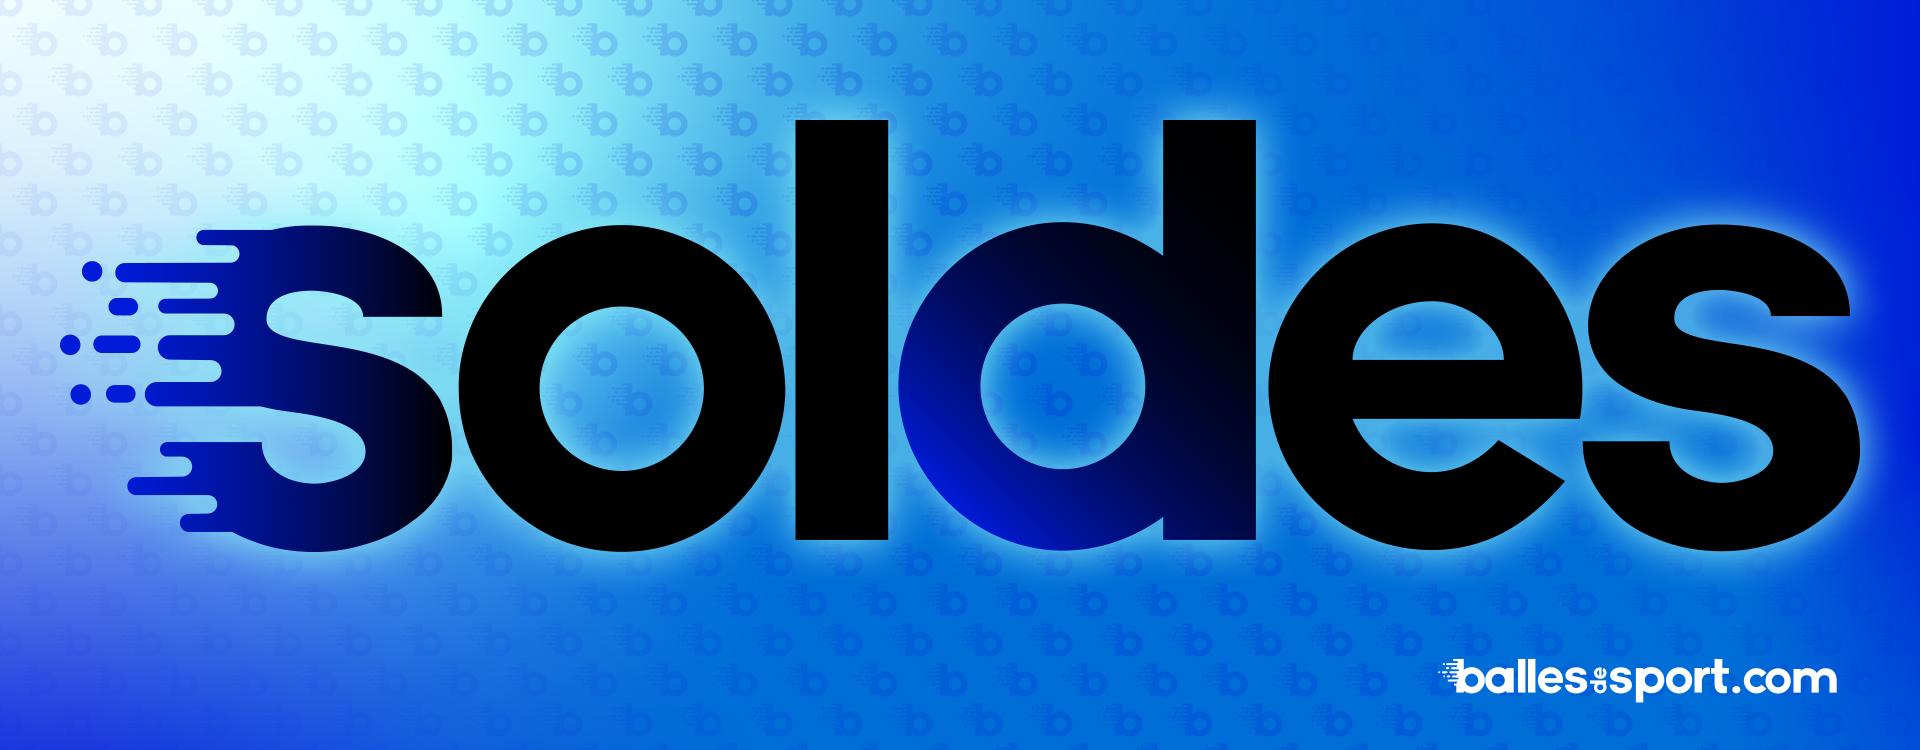 1920x750 Bds Soldesdef